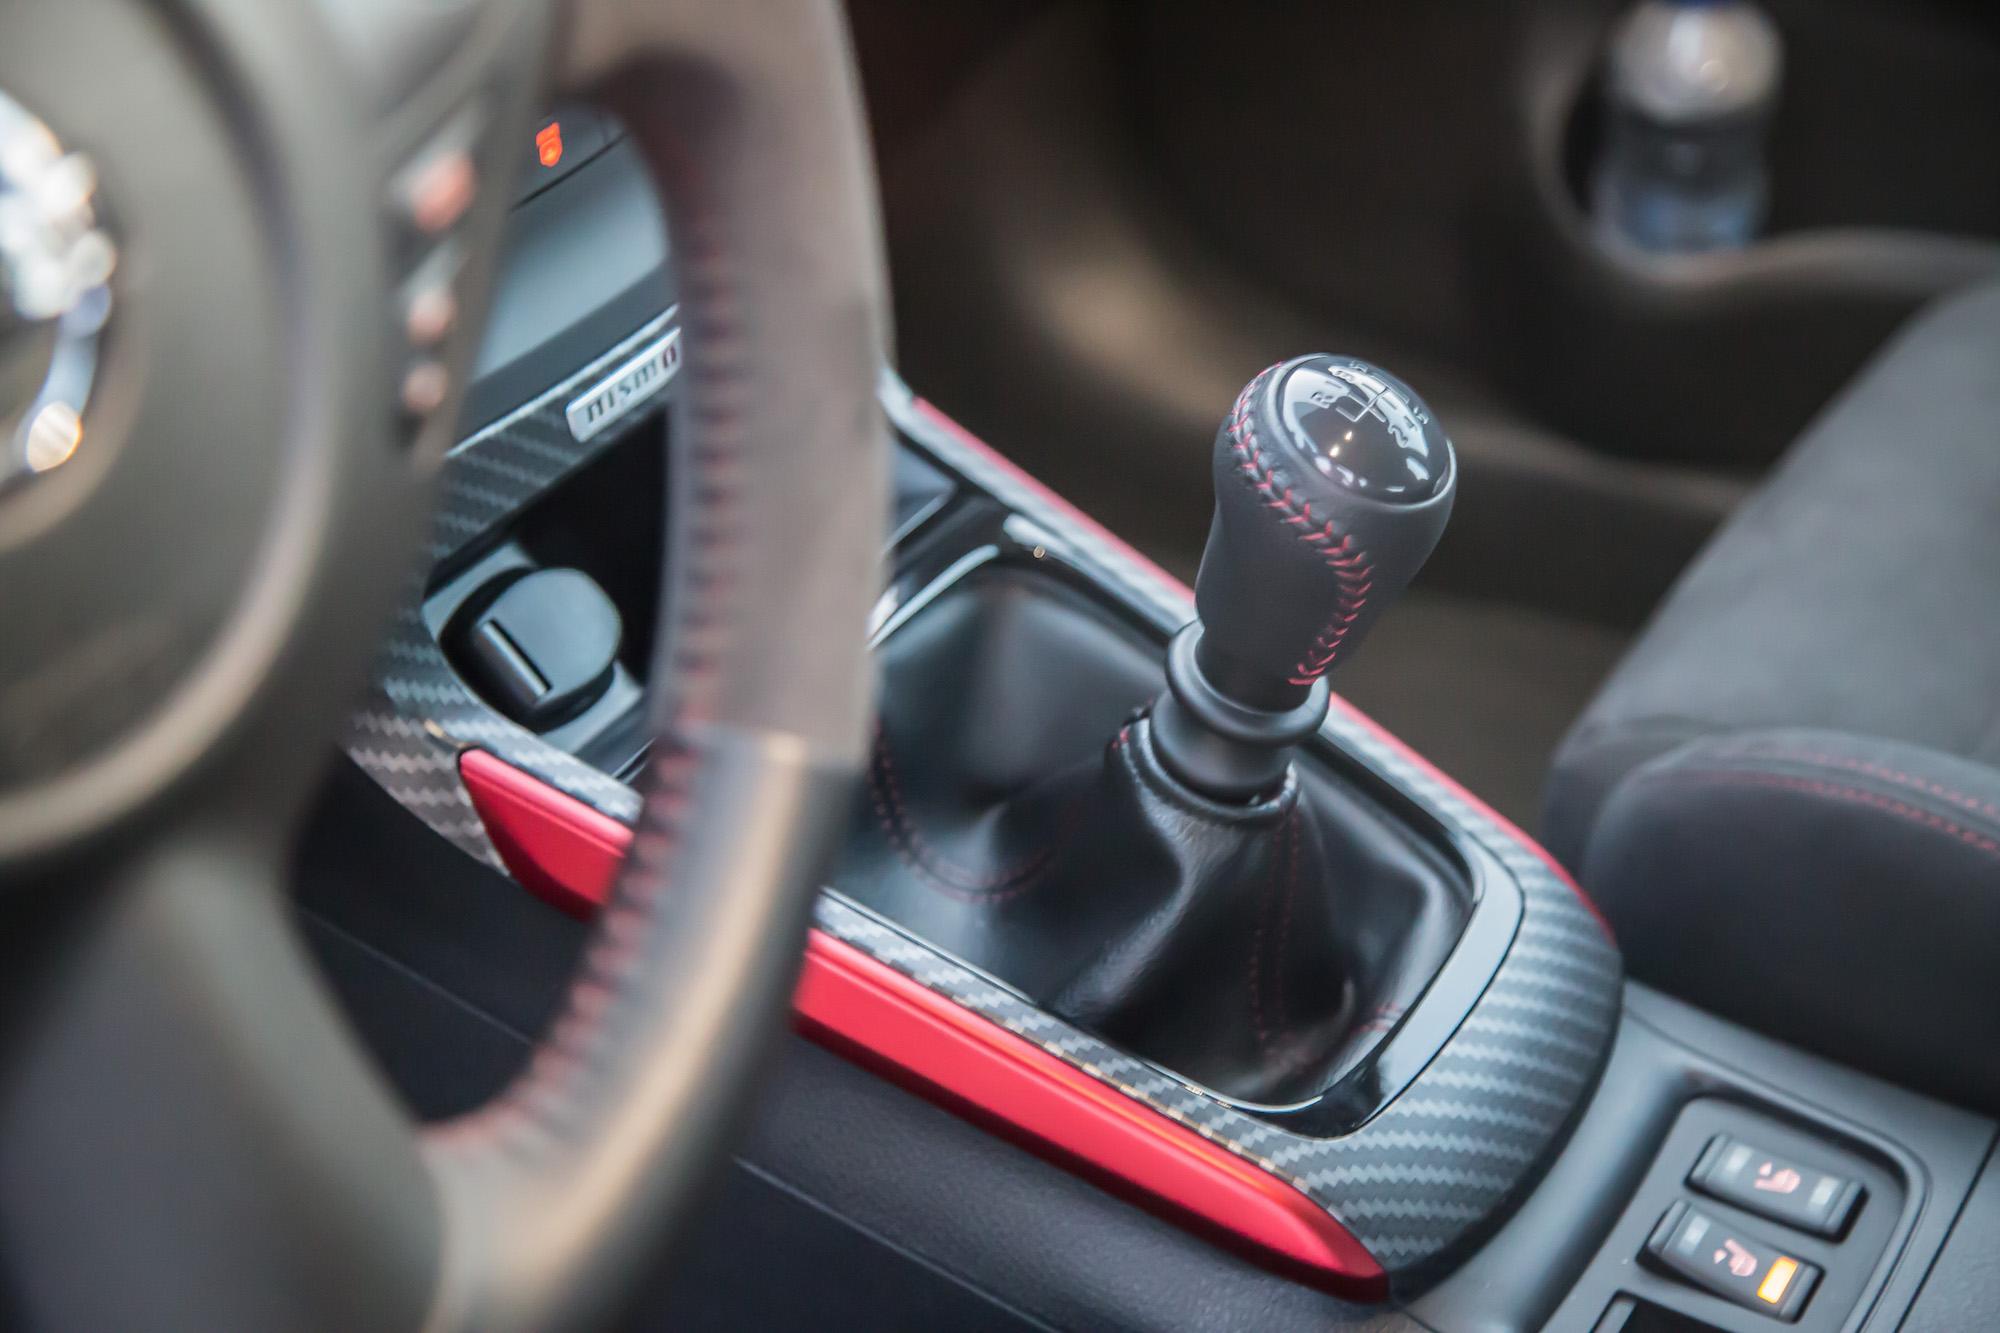 2017 nissan sentra sr turbo manual transmission